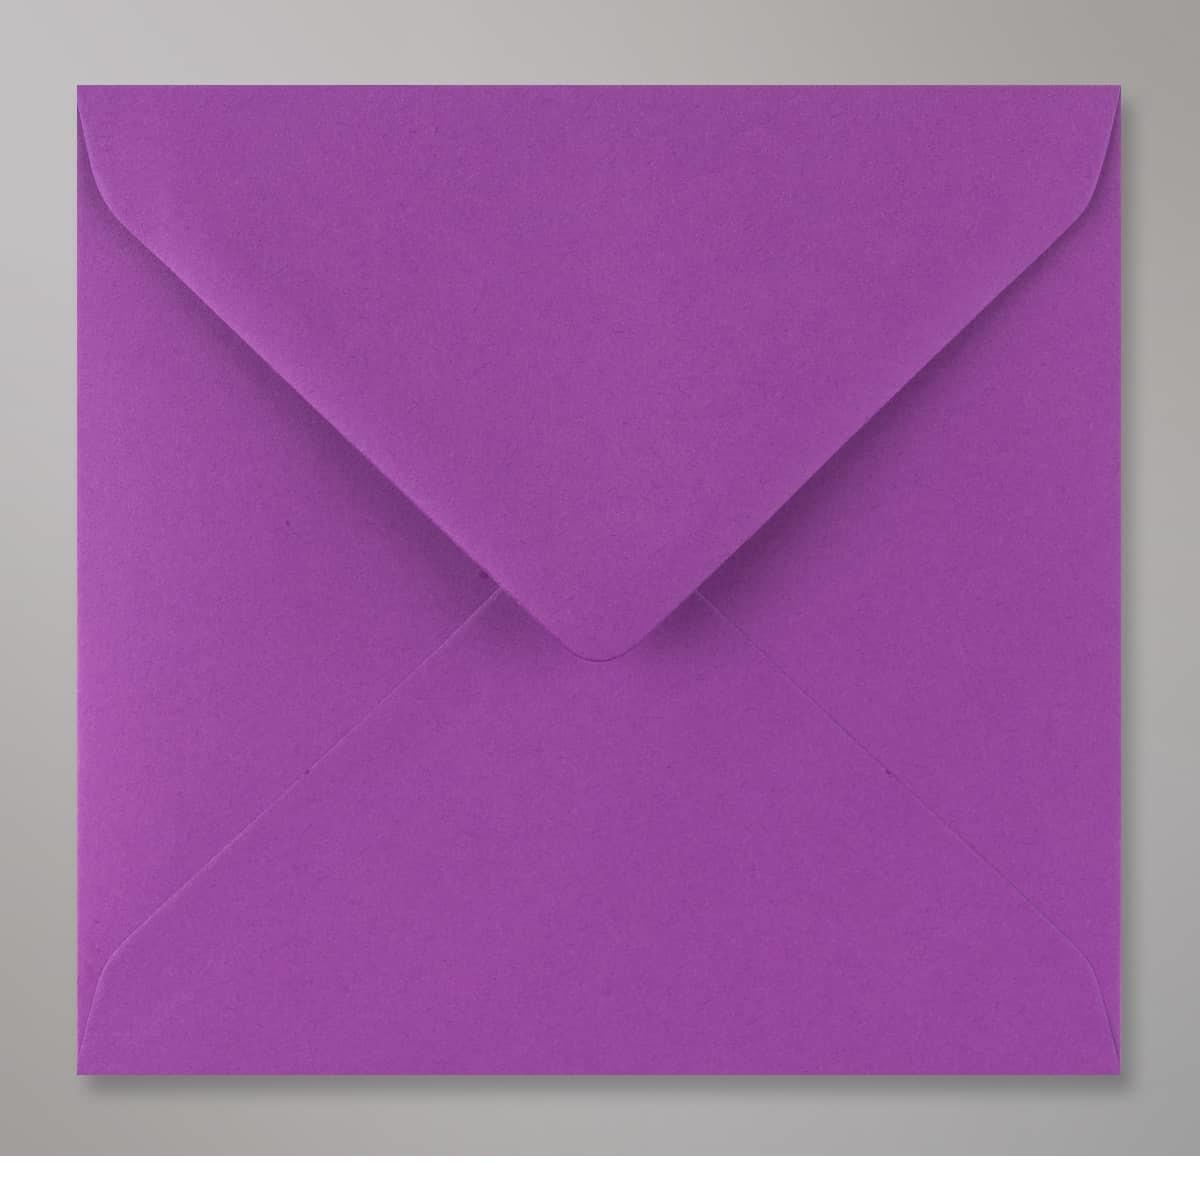 Enveloppe violette 155x155 mm